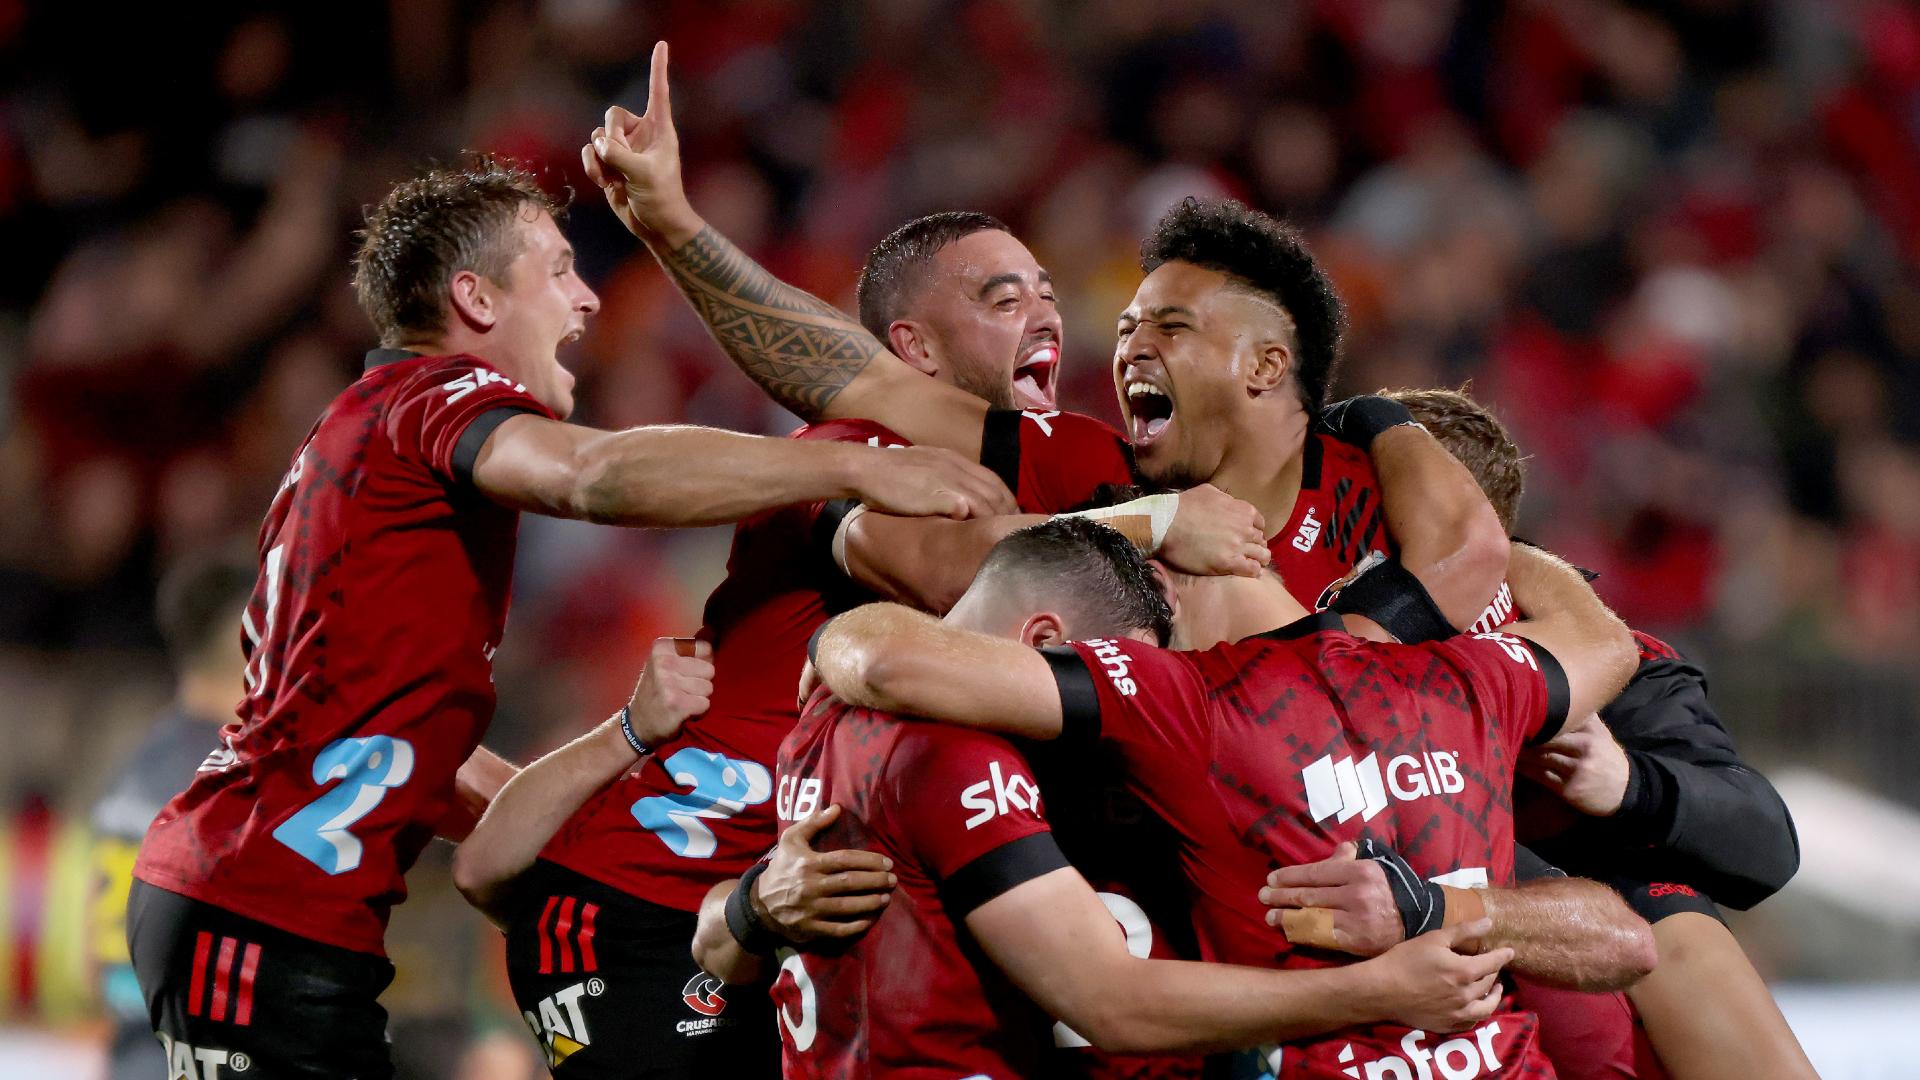 Crusaders 24-13 Chiefs: Mo'unga seals Super Rugby Aotearoa title